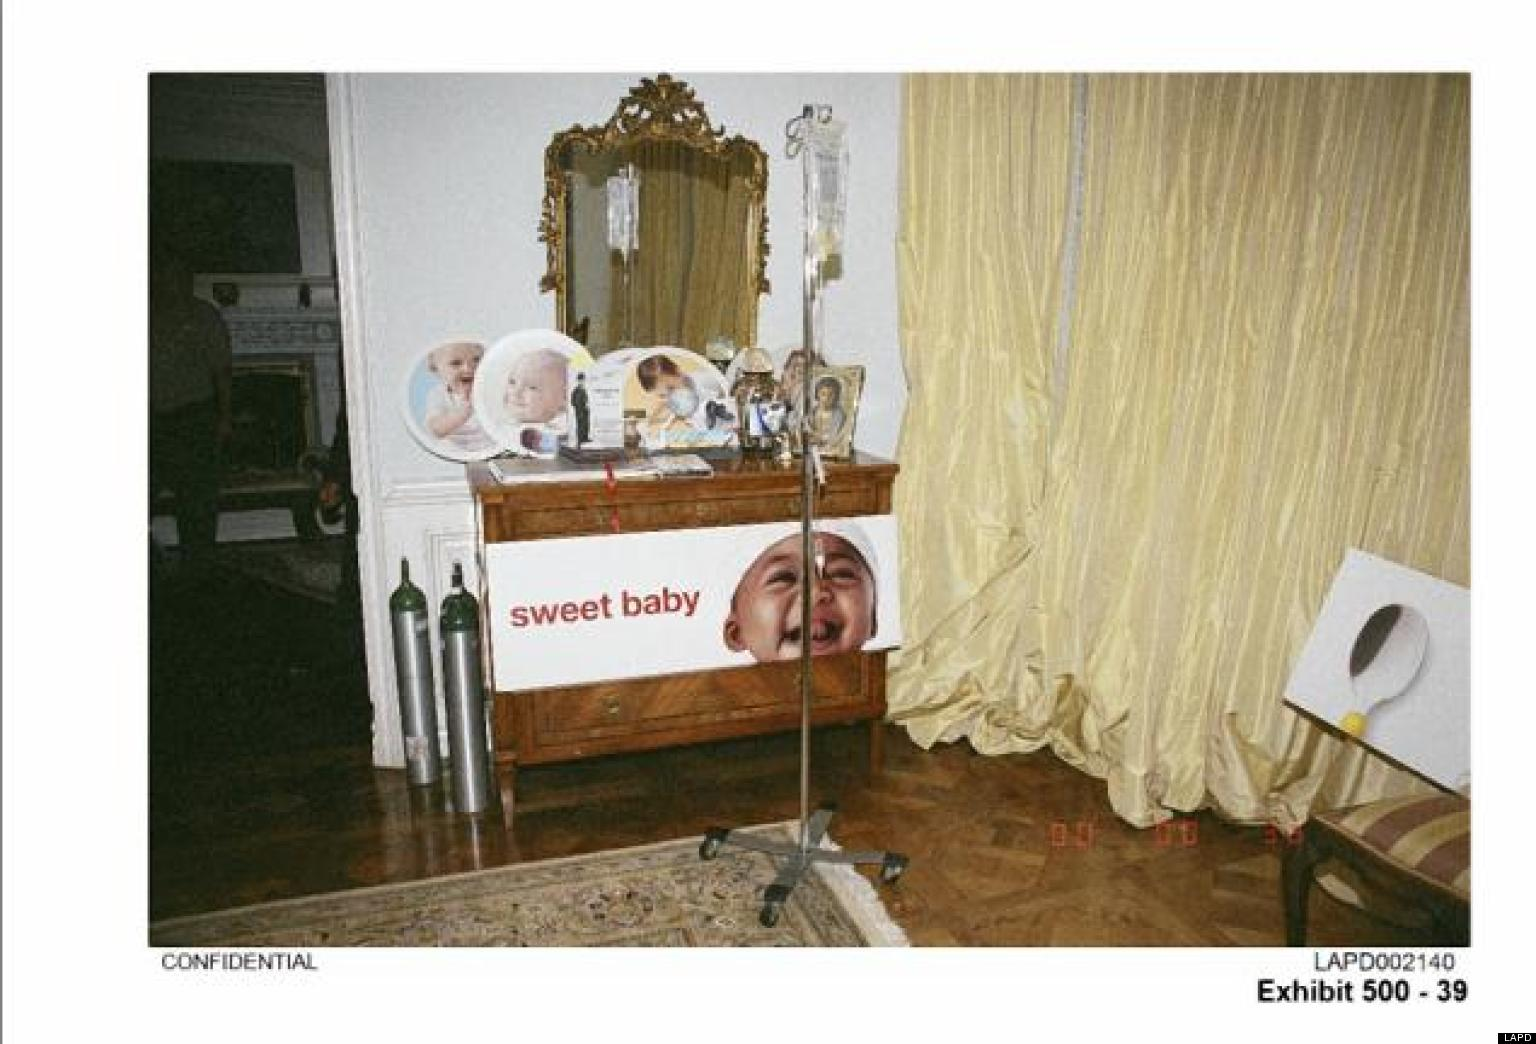 Michael Jackson: LAPD Release Images Of Singer's Bedroom